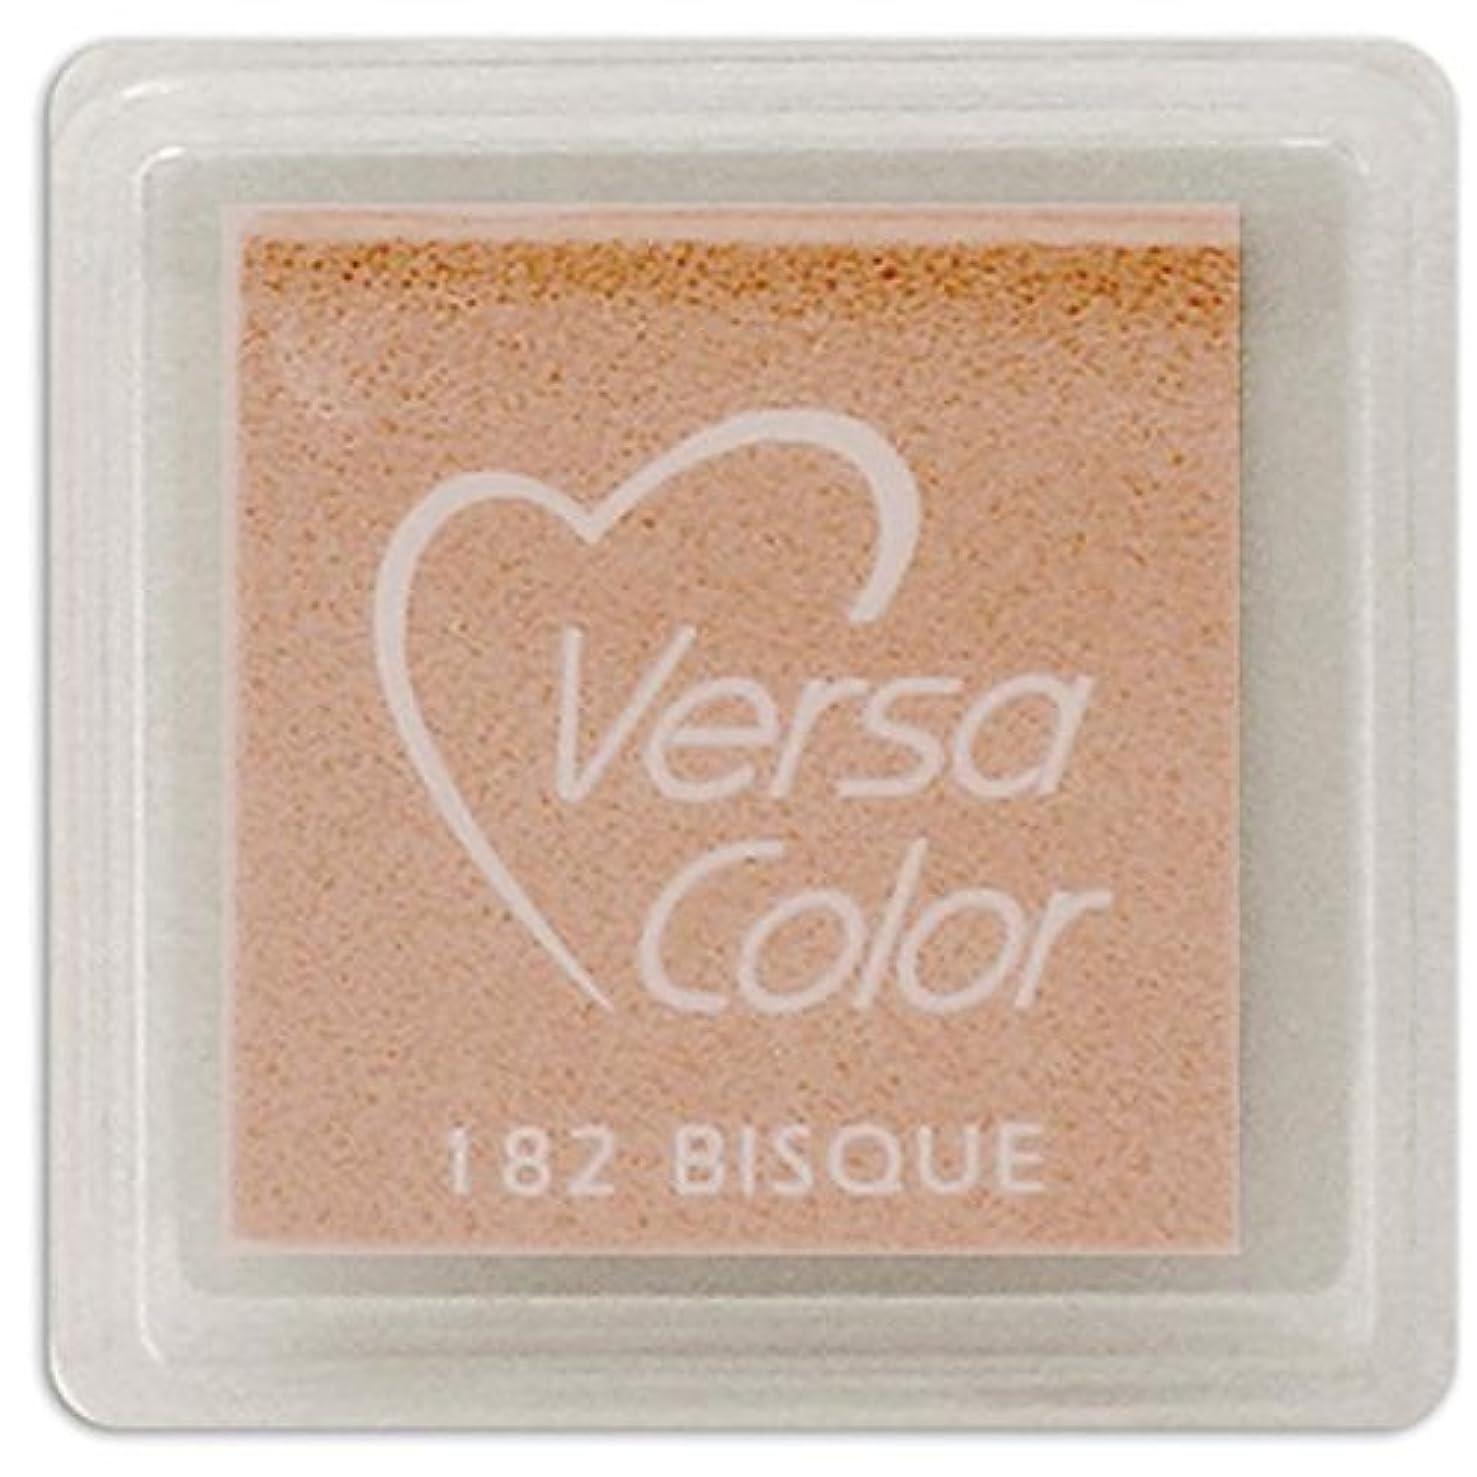 Tsukineko Small-Size VersaColor Ultimate Pigment Inkpad, Bisque